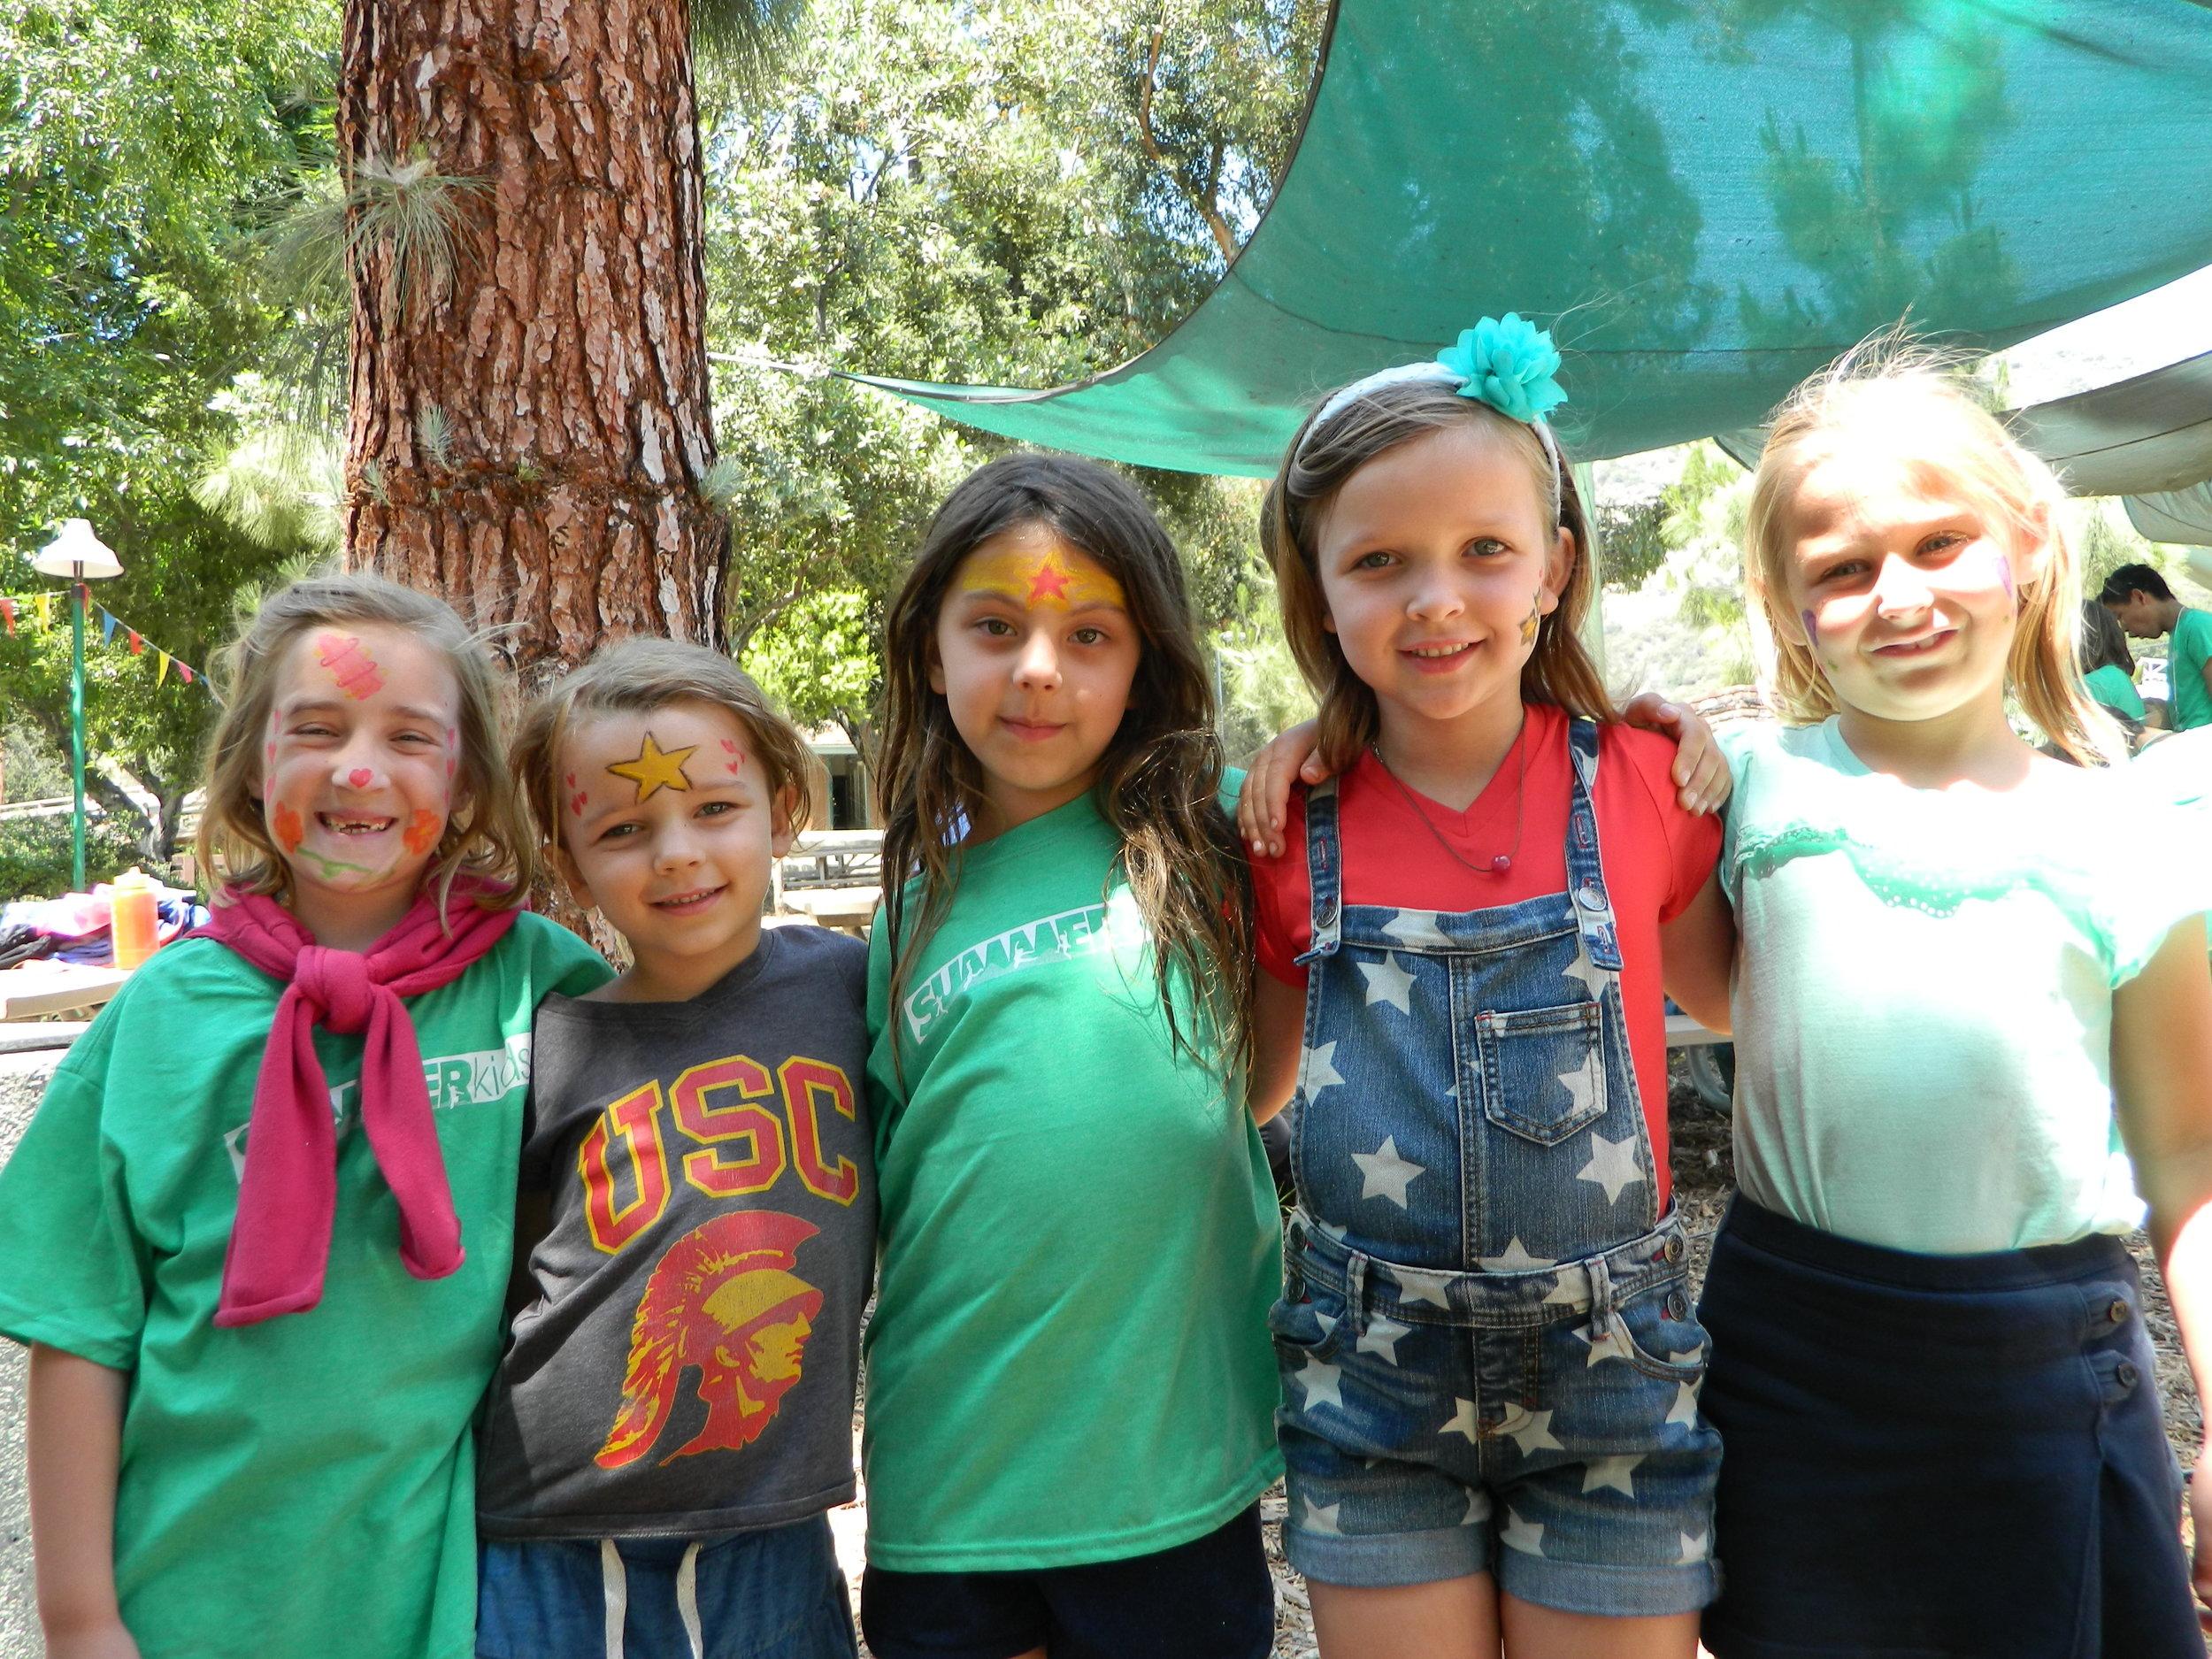 Summerkids is a place where campers make lifelong memories,